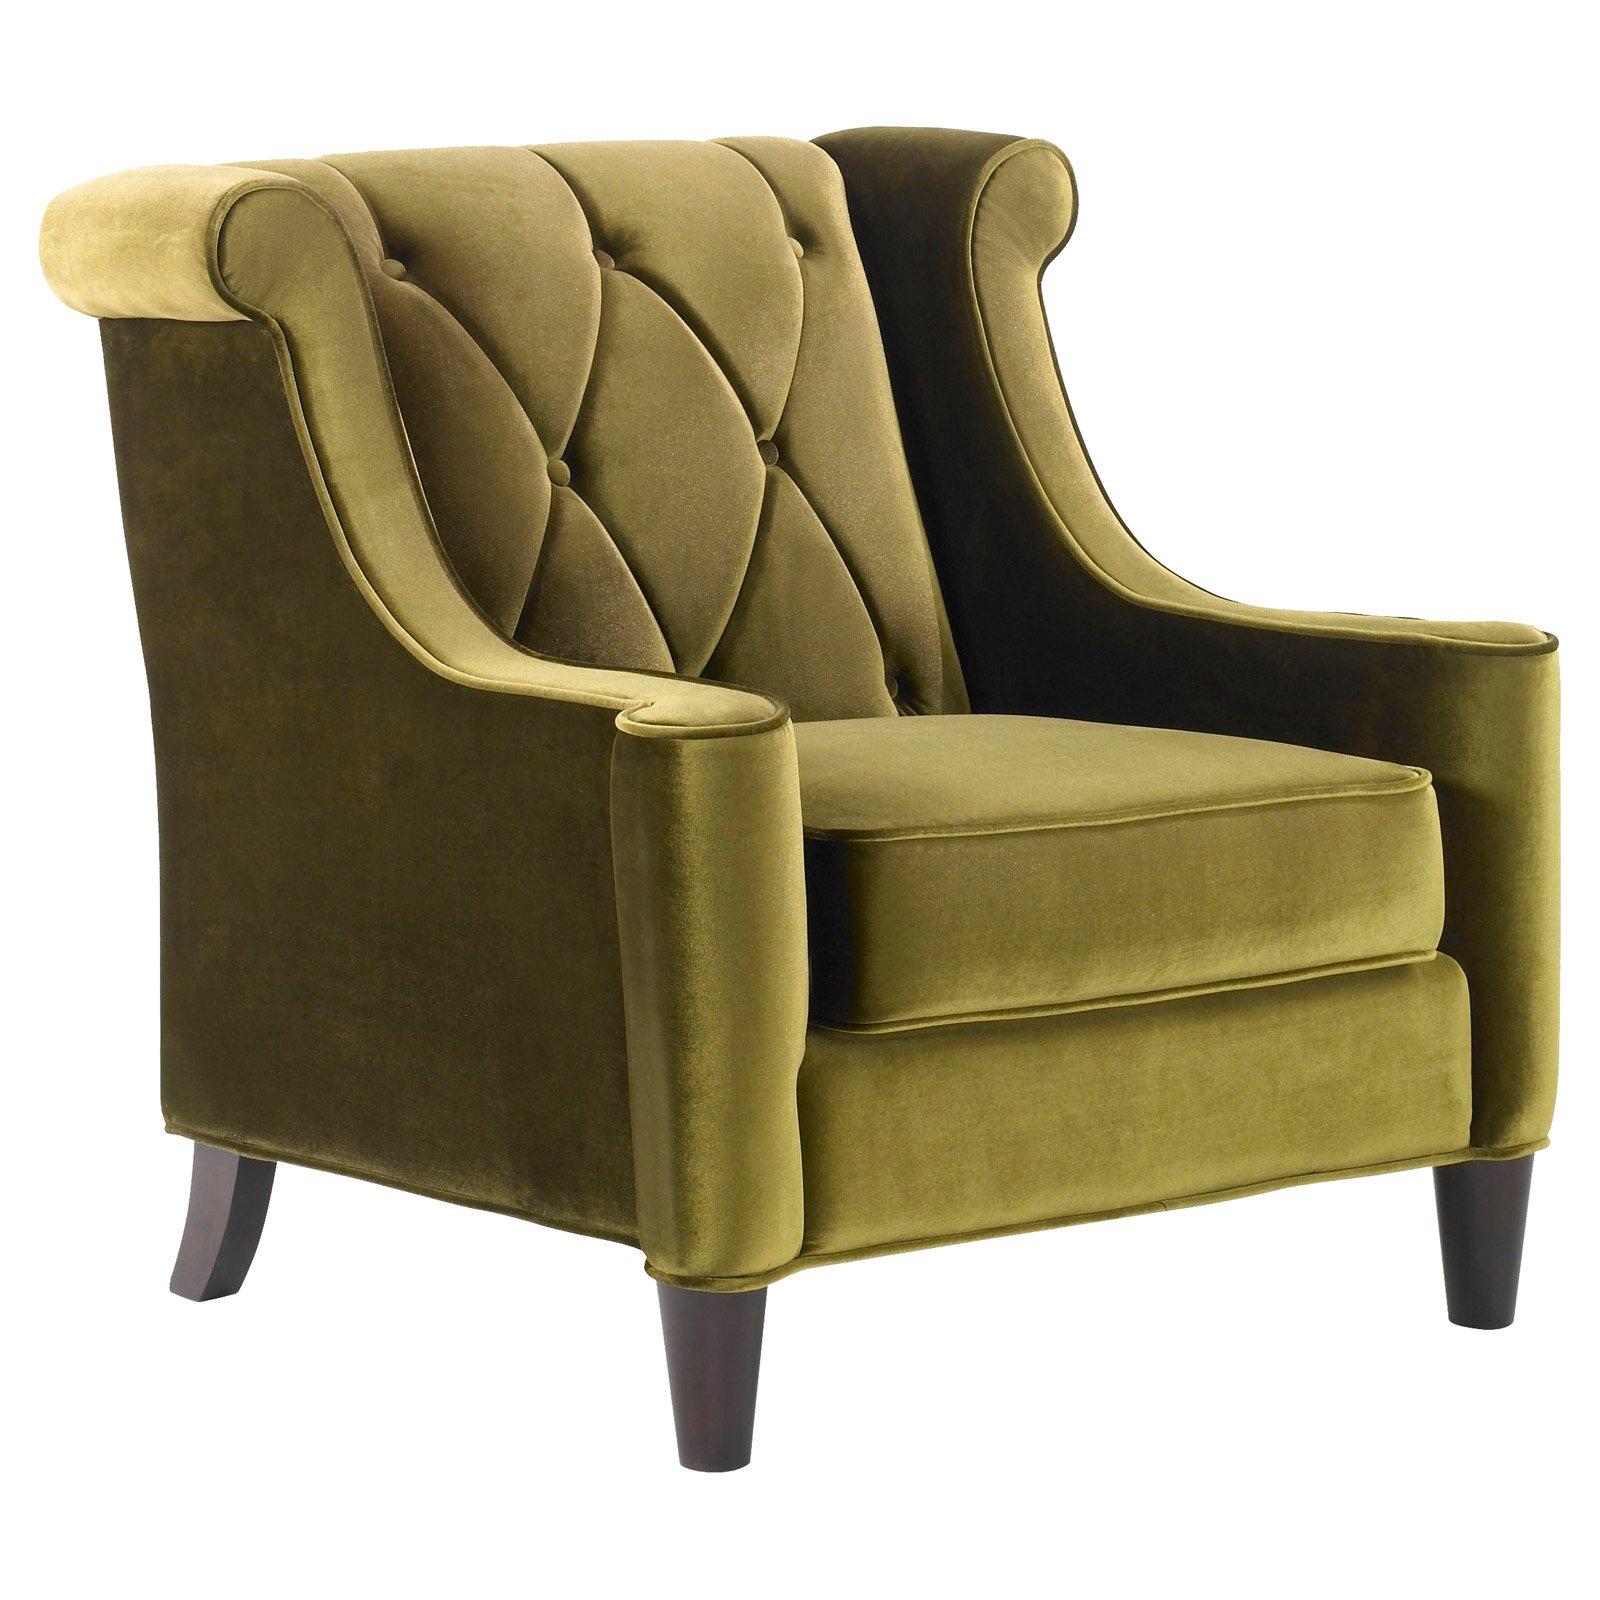 Armen Living Barrister Chair, Green Velvet with Green Piping